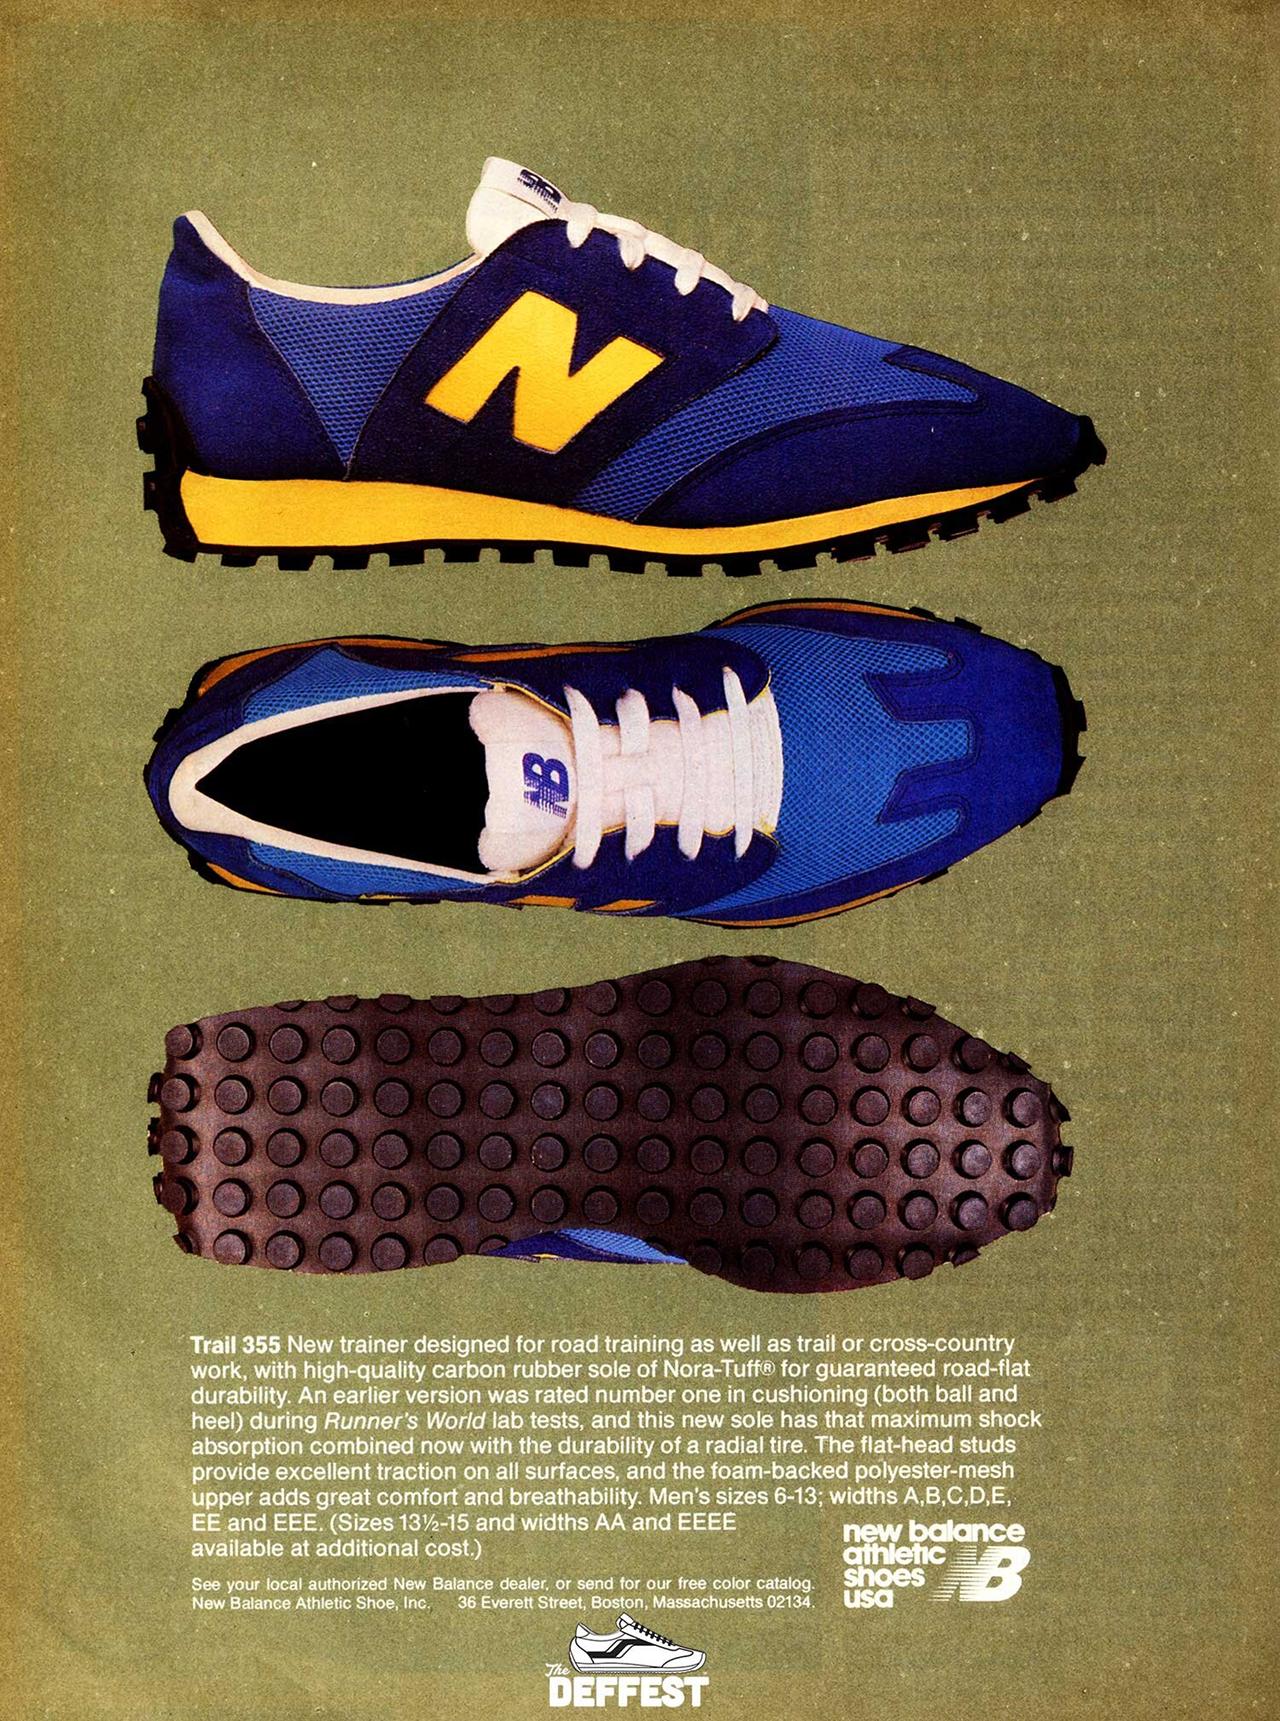 New Balance 355 - Original ad